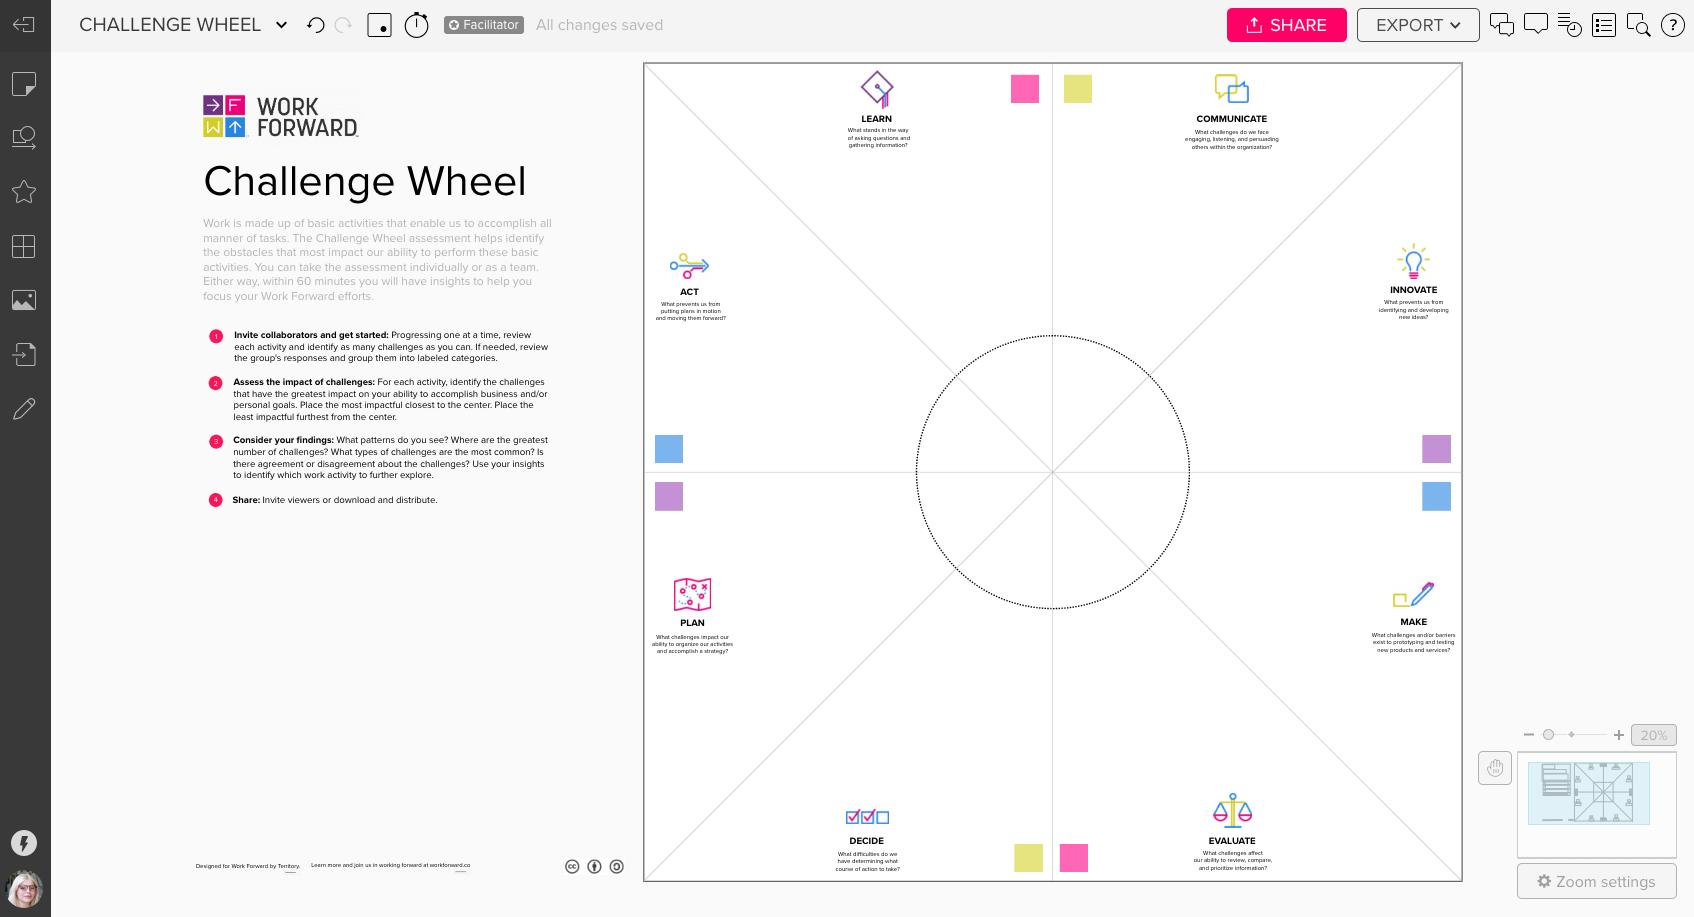 Challenge Wheel